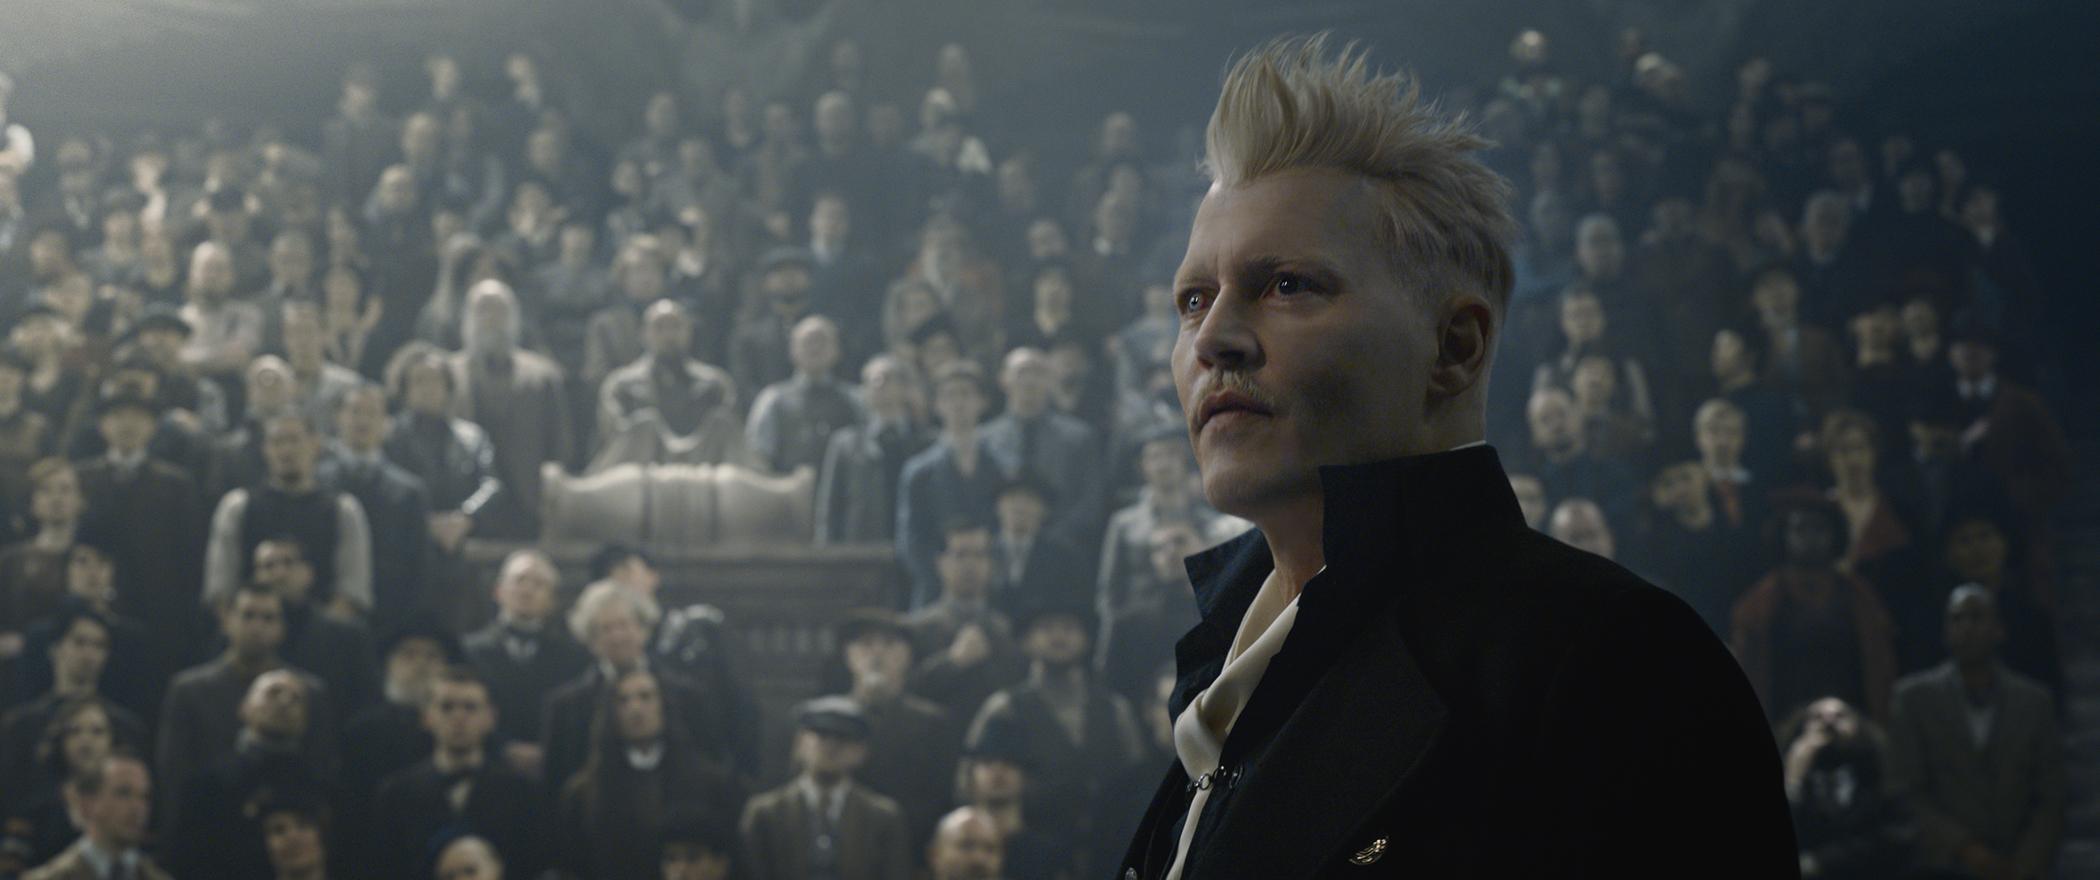 Fantastic Beasts 2 Images Reveal Johnny Depp Nicolas Flamel 2100x880